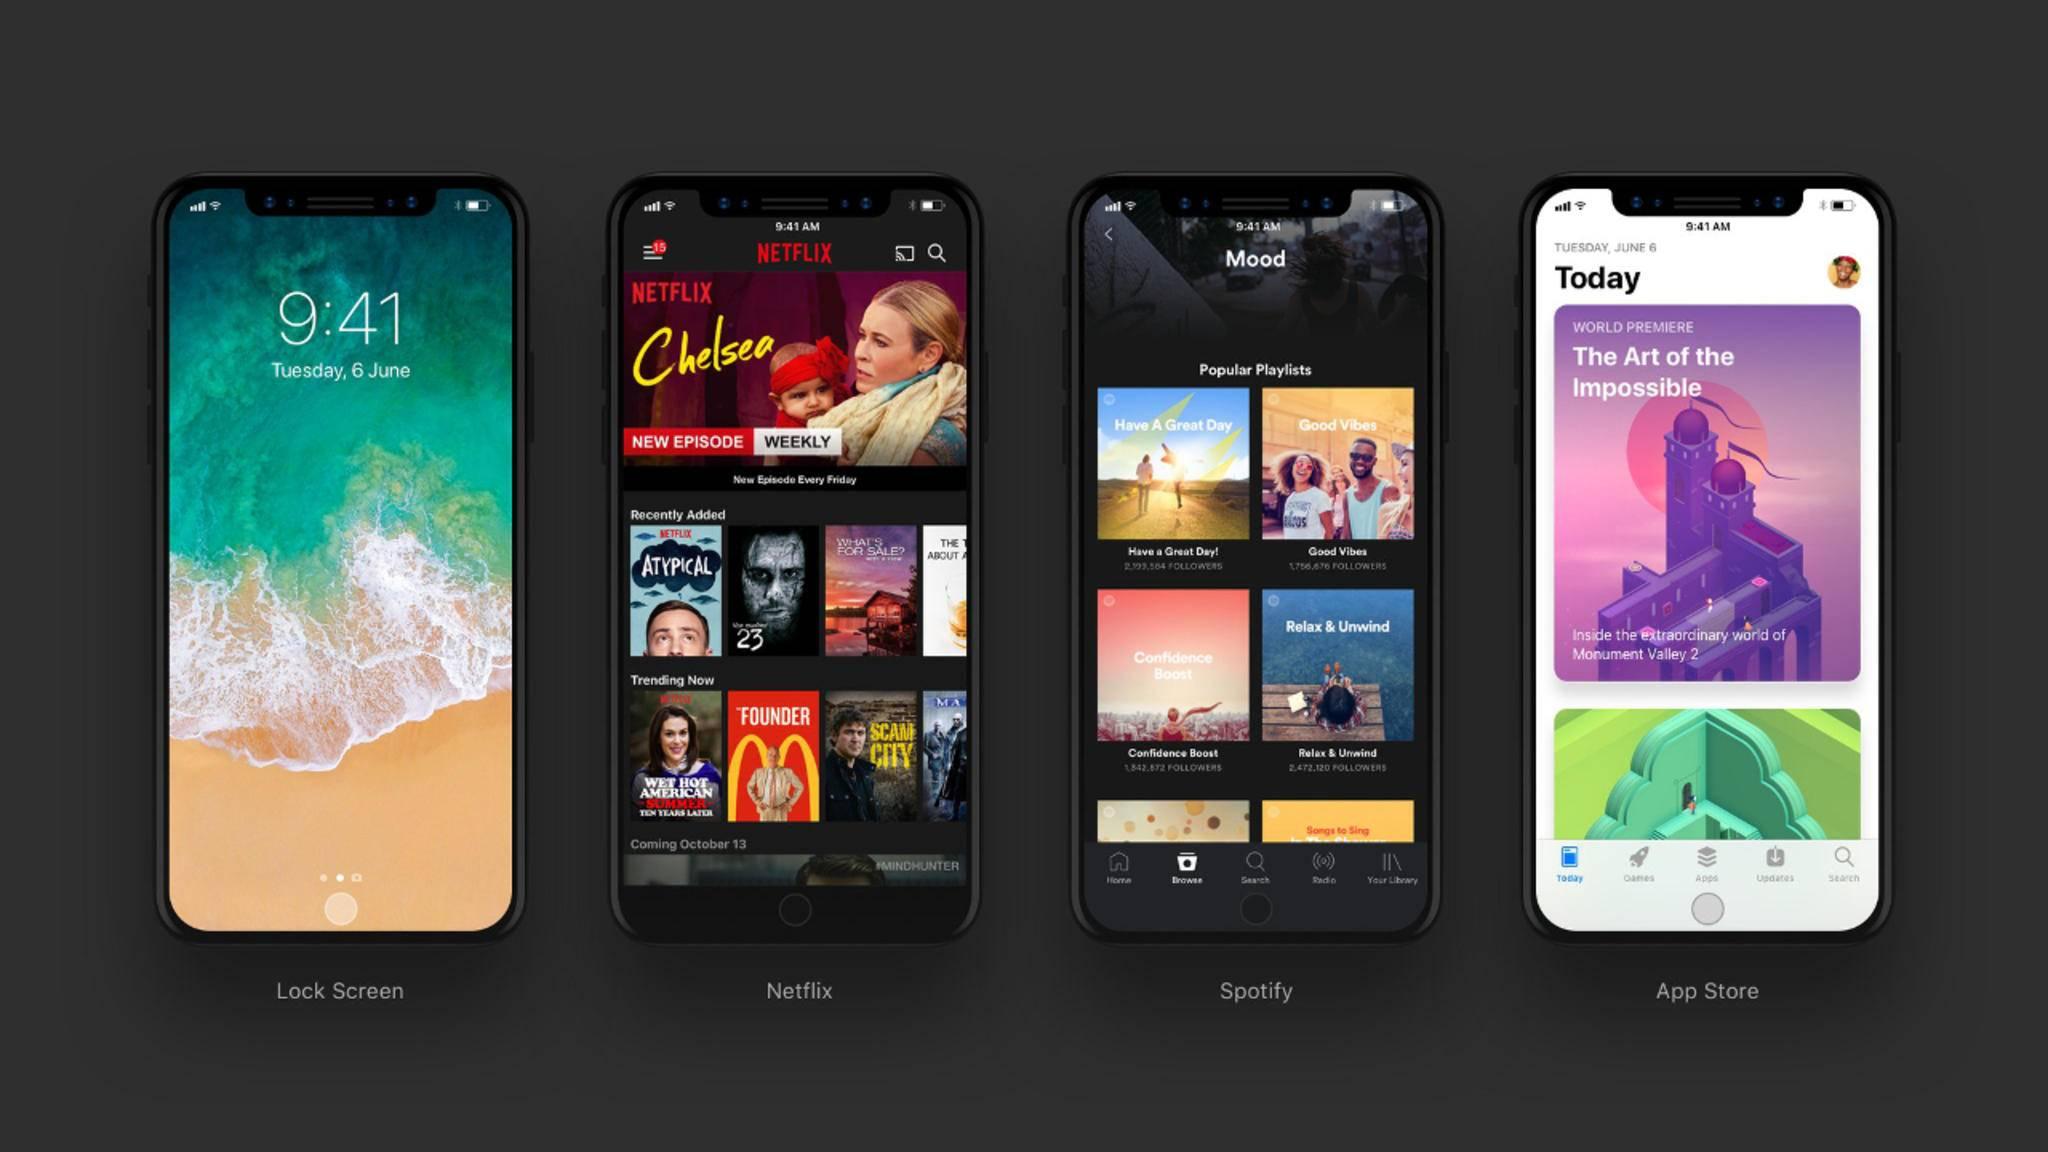 Apples Flaggschiff mit randlosem OLED-Panel soll passend zum Jubiläum den Namen iPhone X tragen.